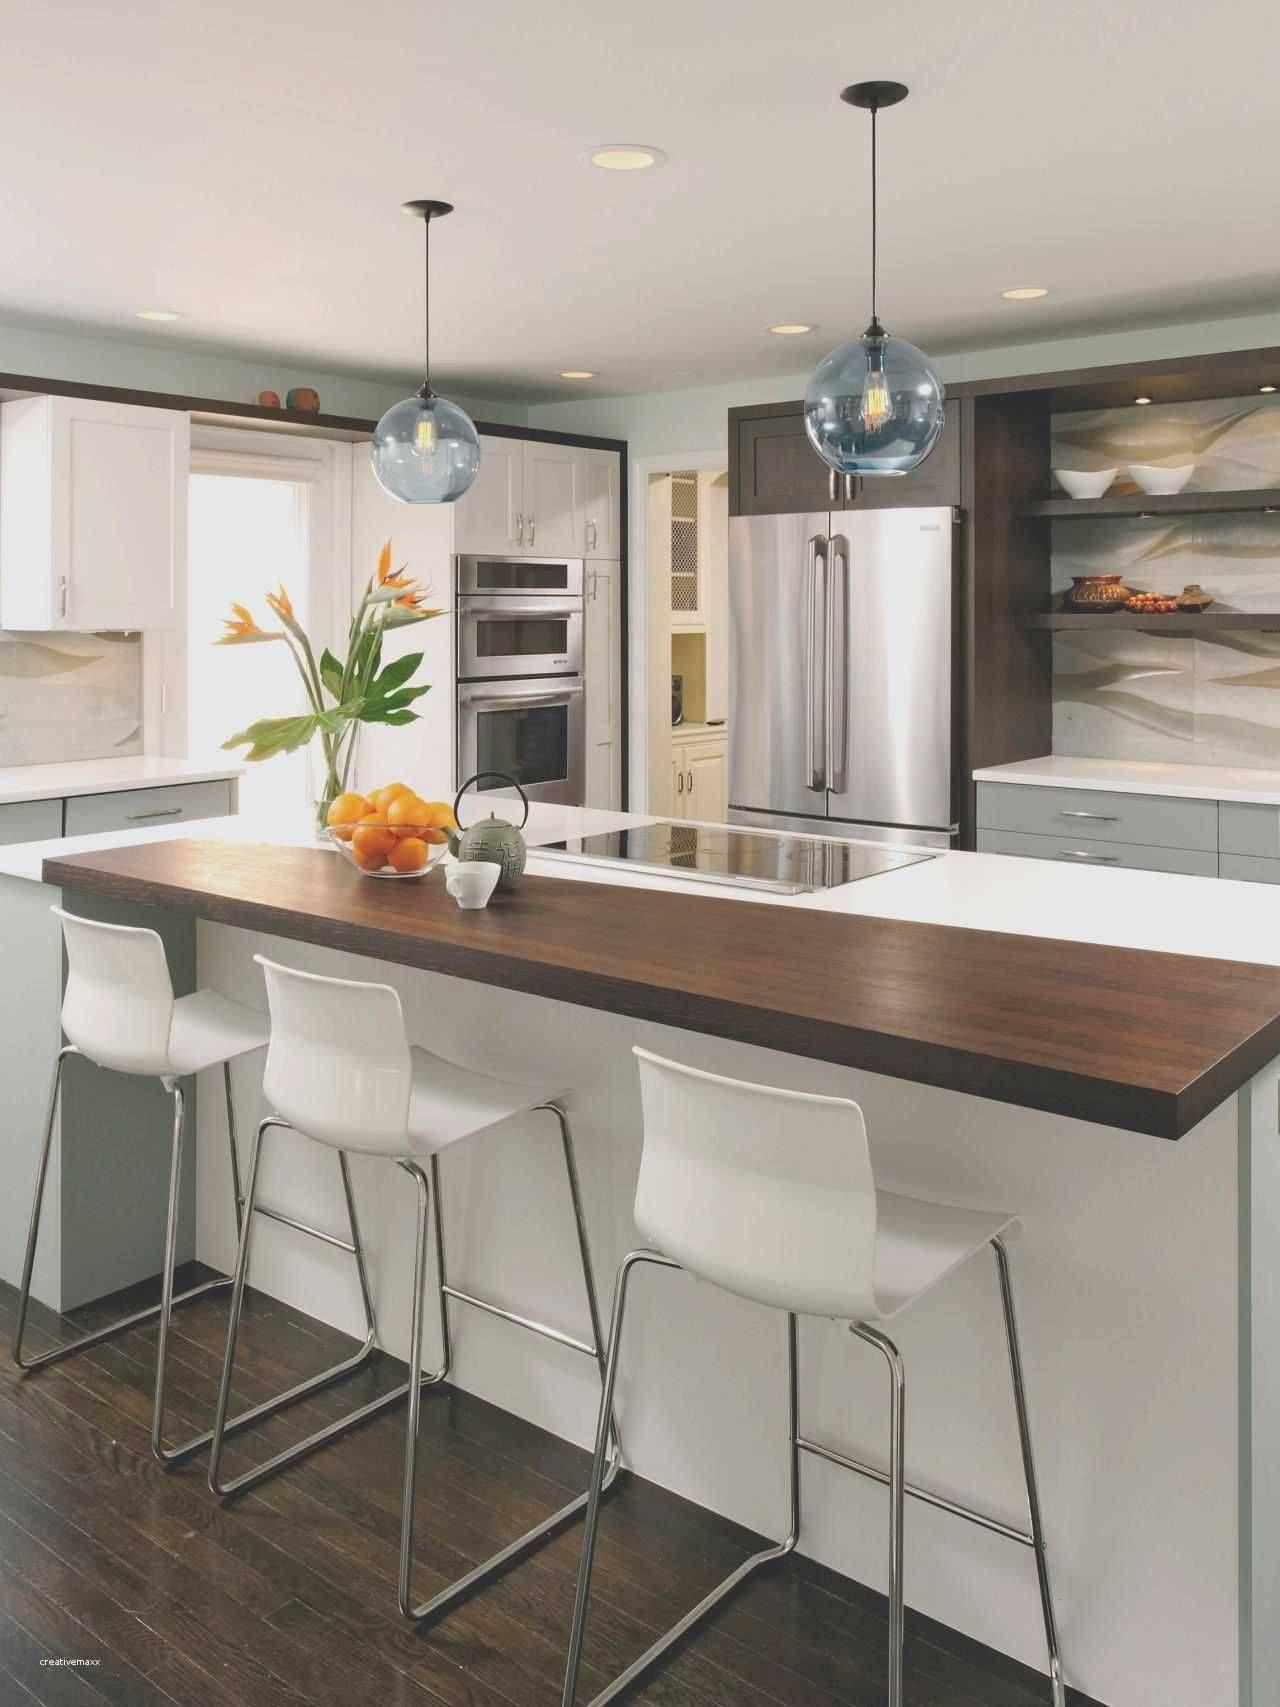 Narrow Kitchen Island Homedecor Interiordesign Interior Home Decor Design Kitchen Design Small Contemporary Kitchen Decor Affordable Farmhouse Kitchen